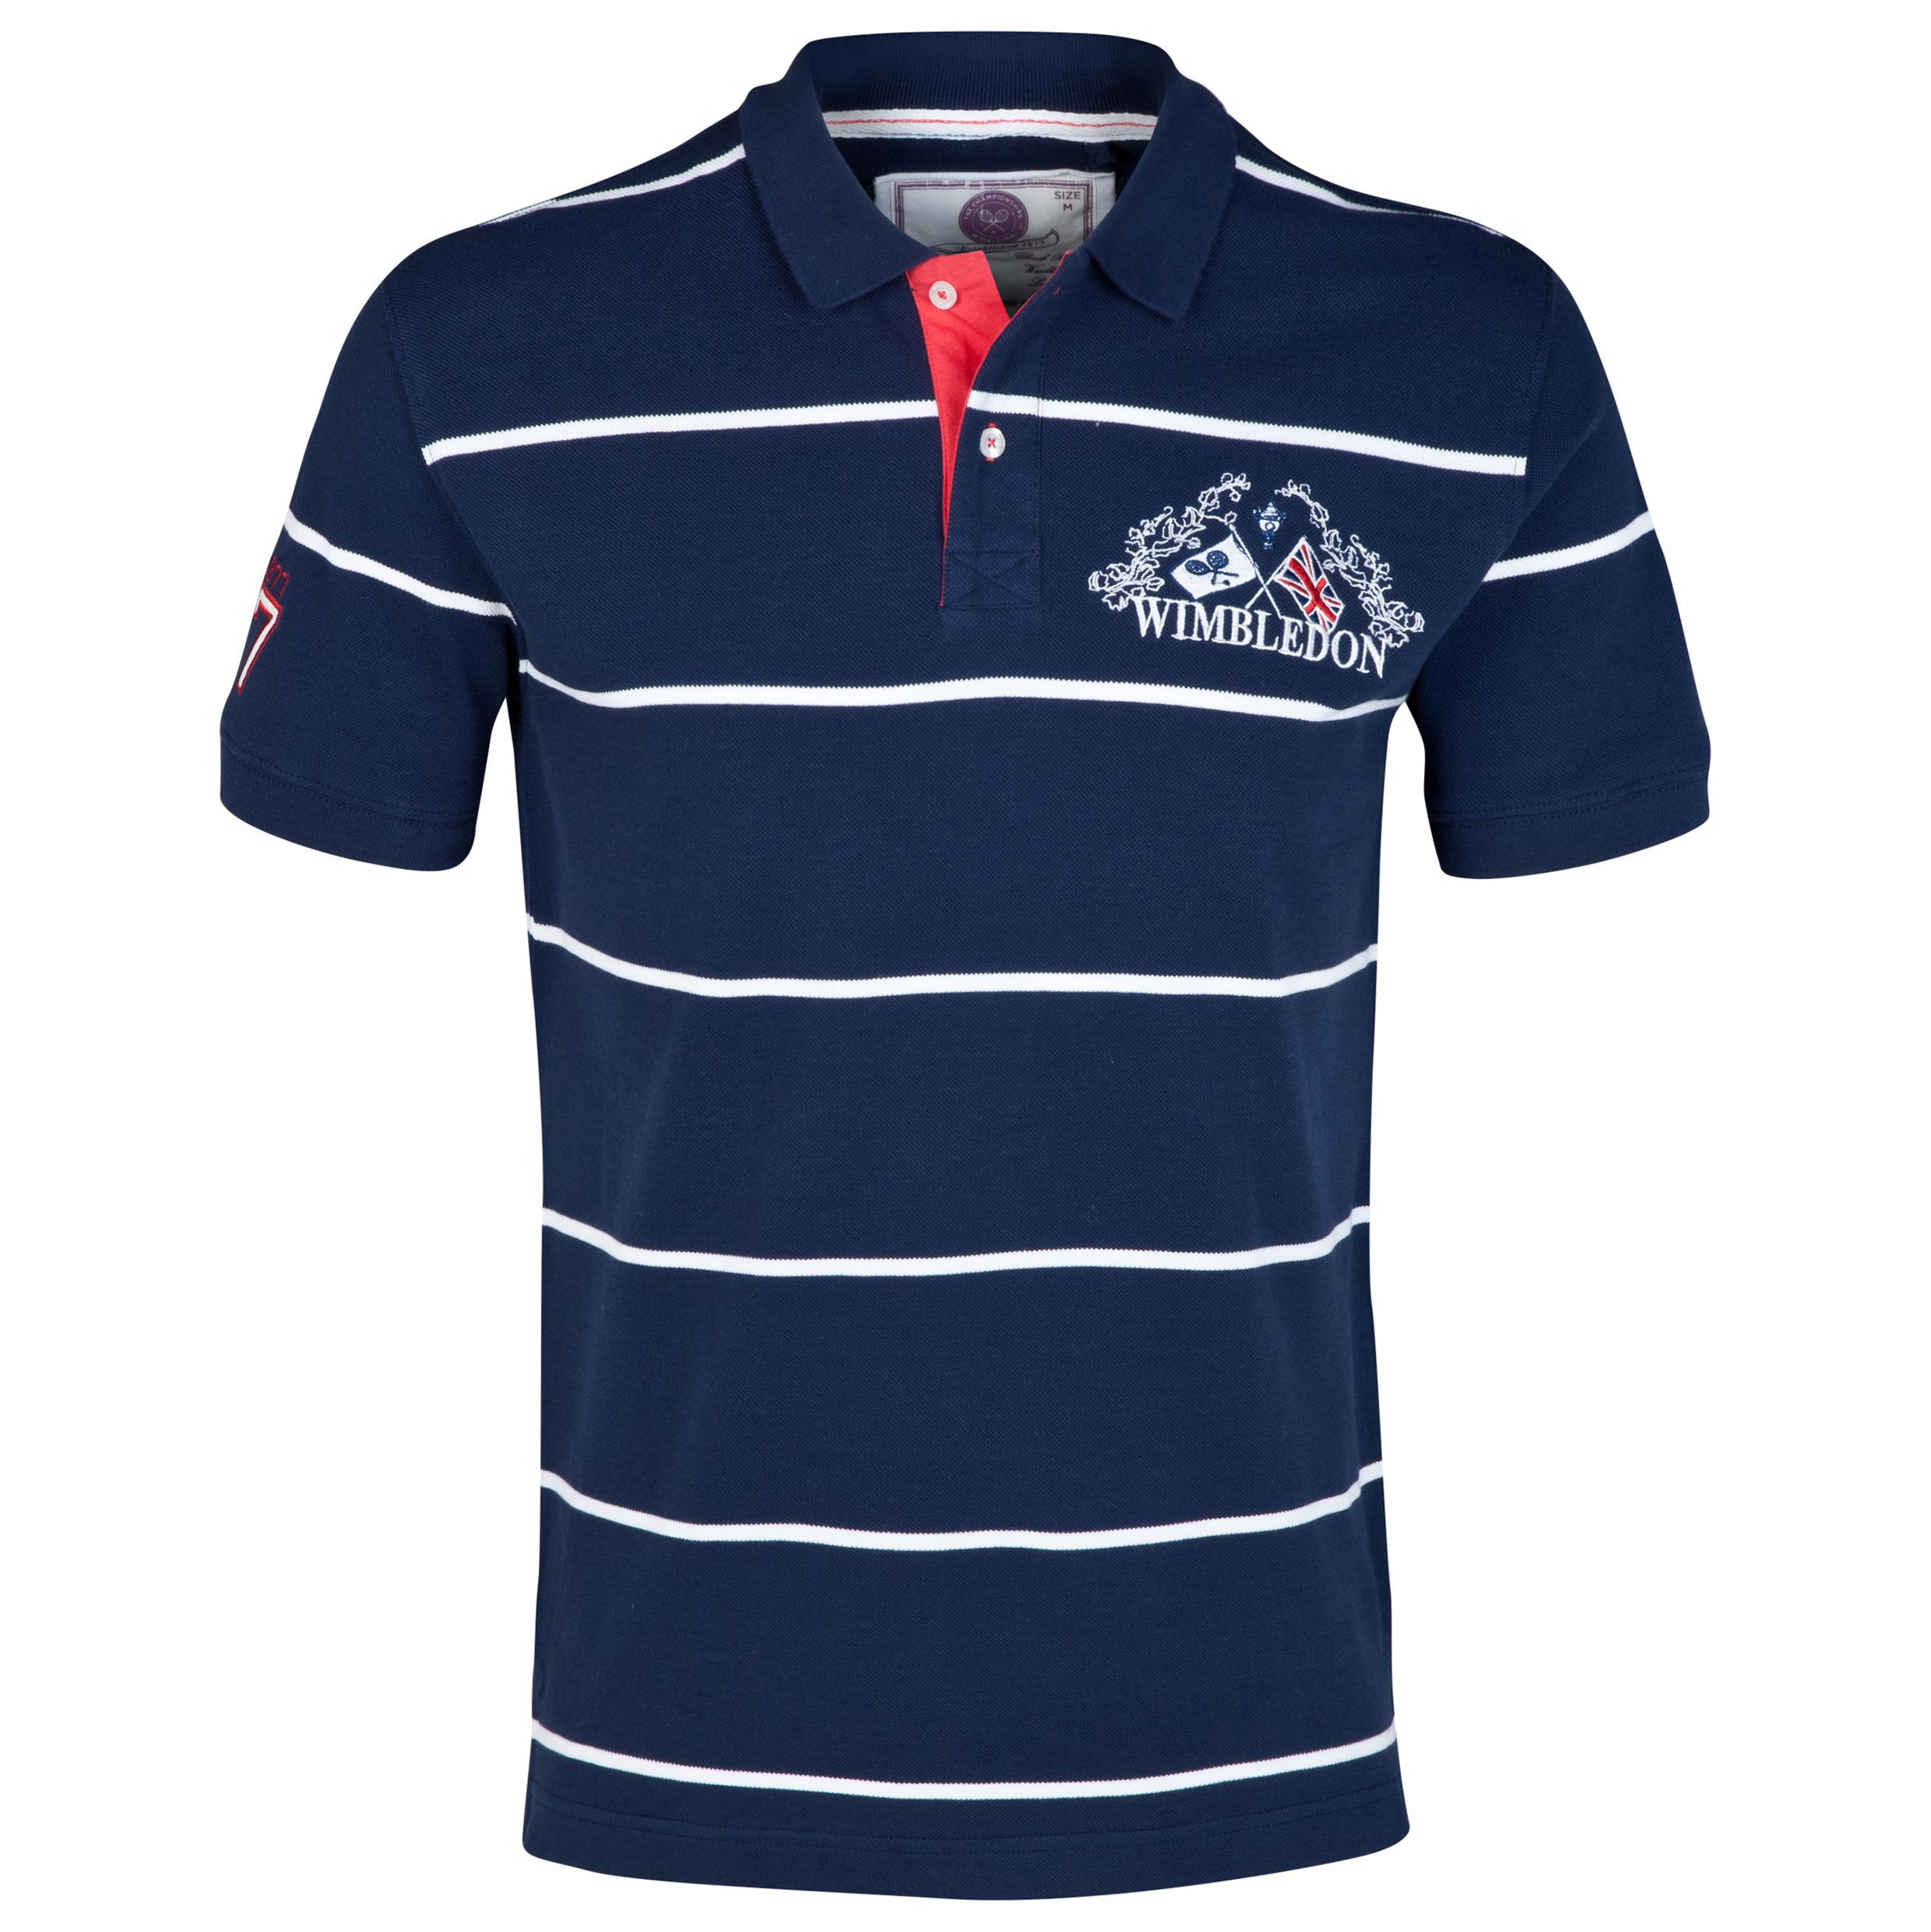 Wimbledon Jacquard Stripe Polo Shirt